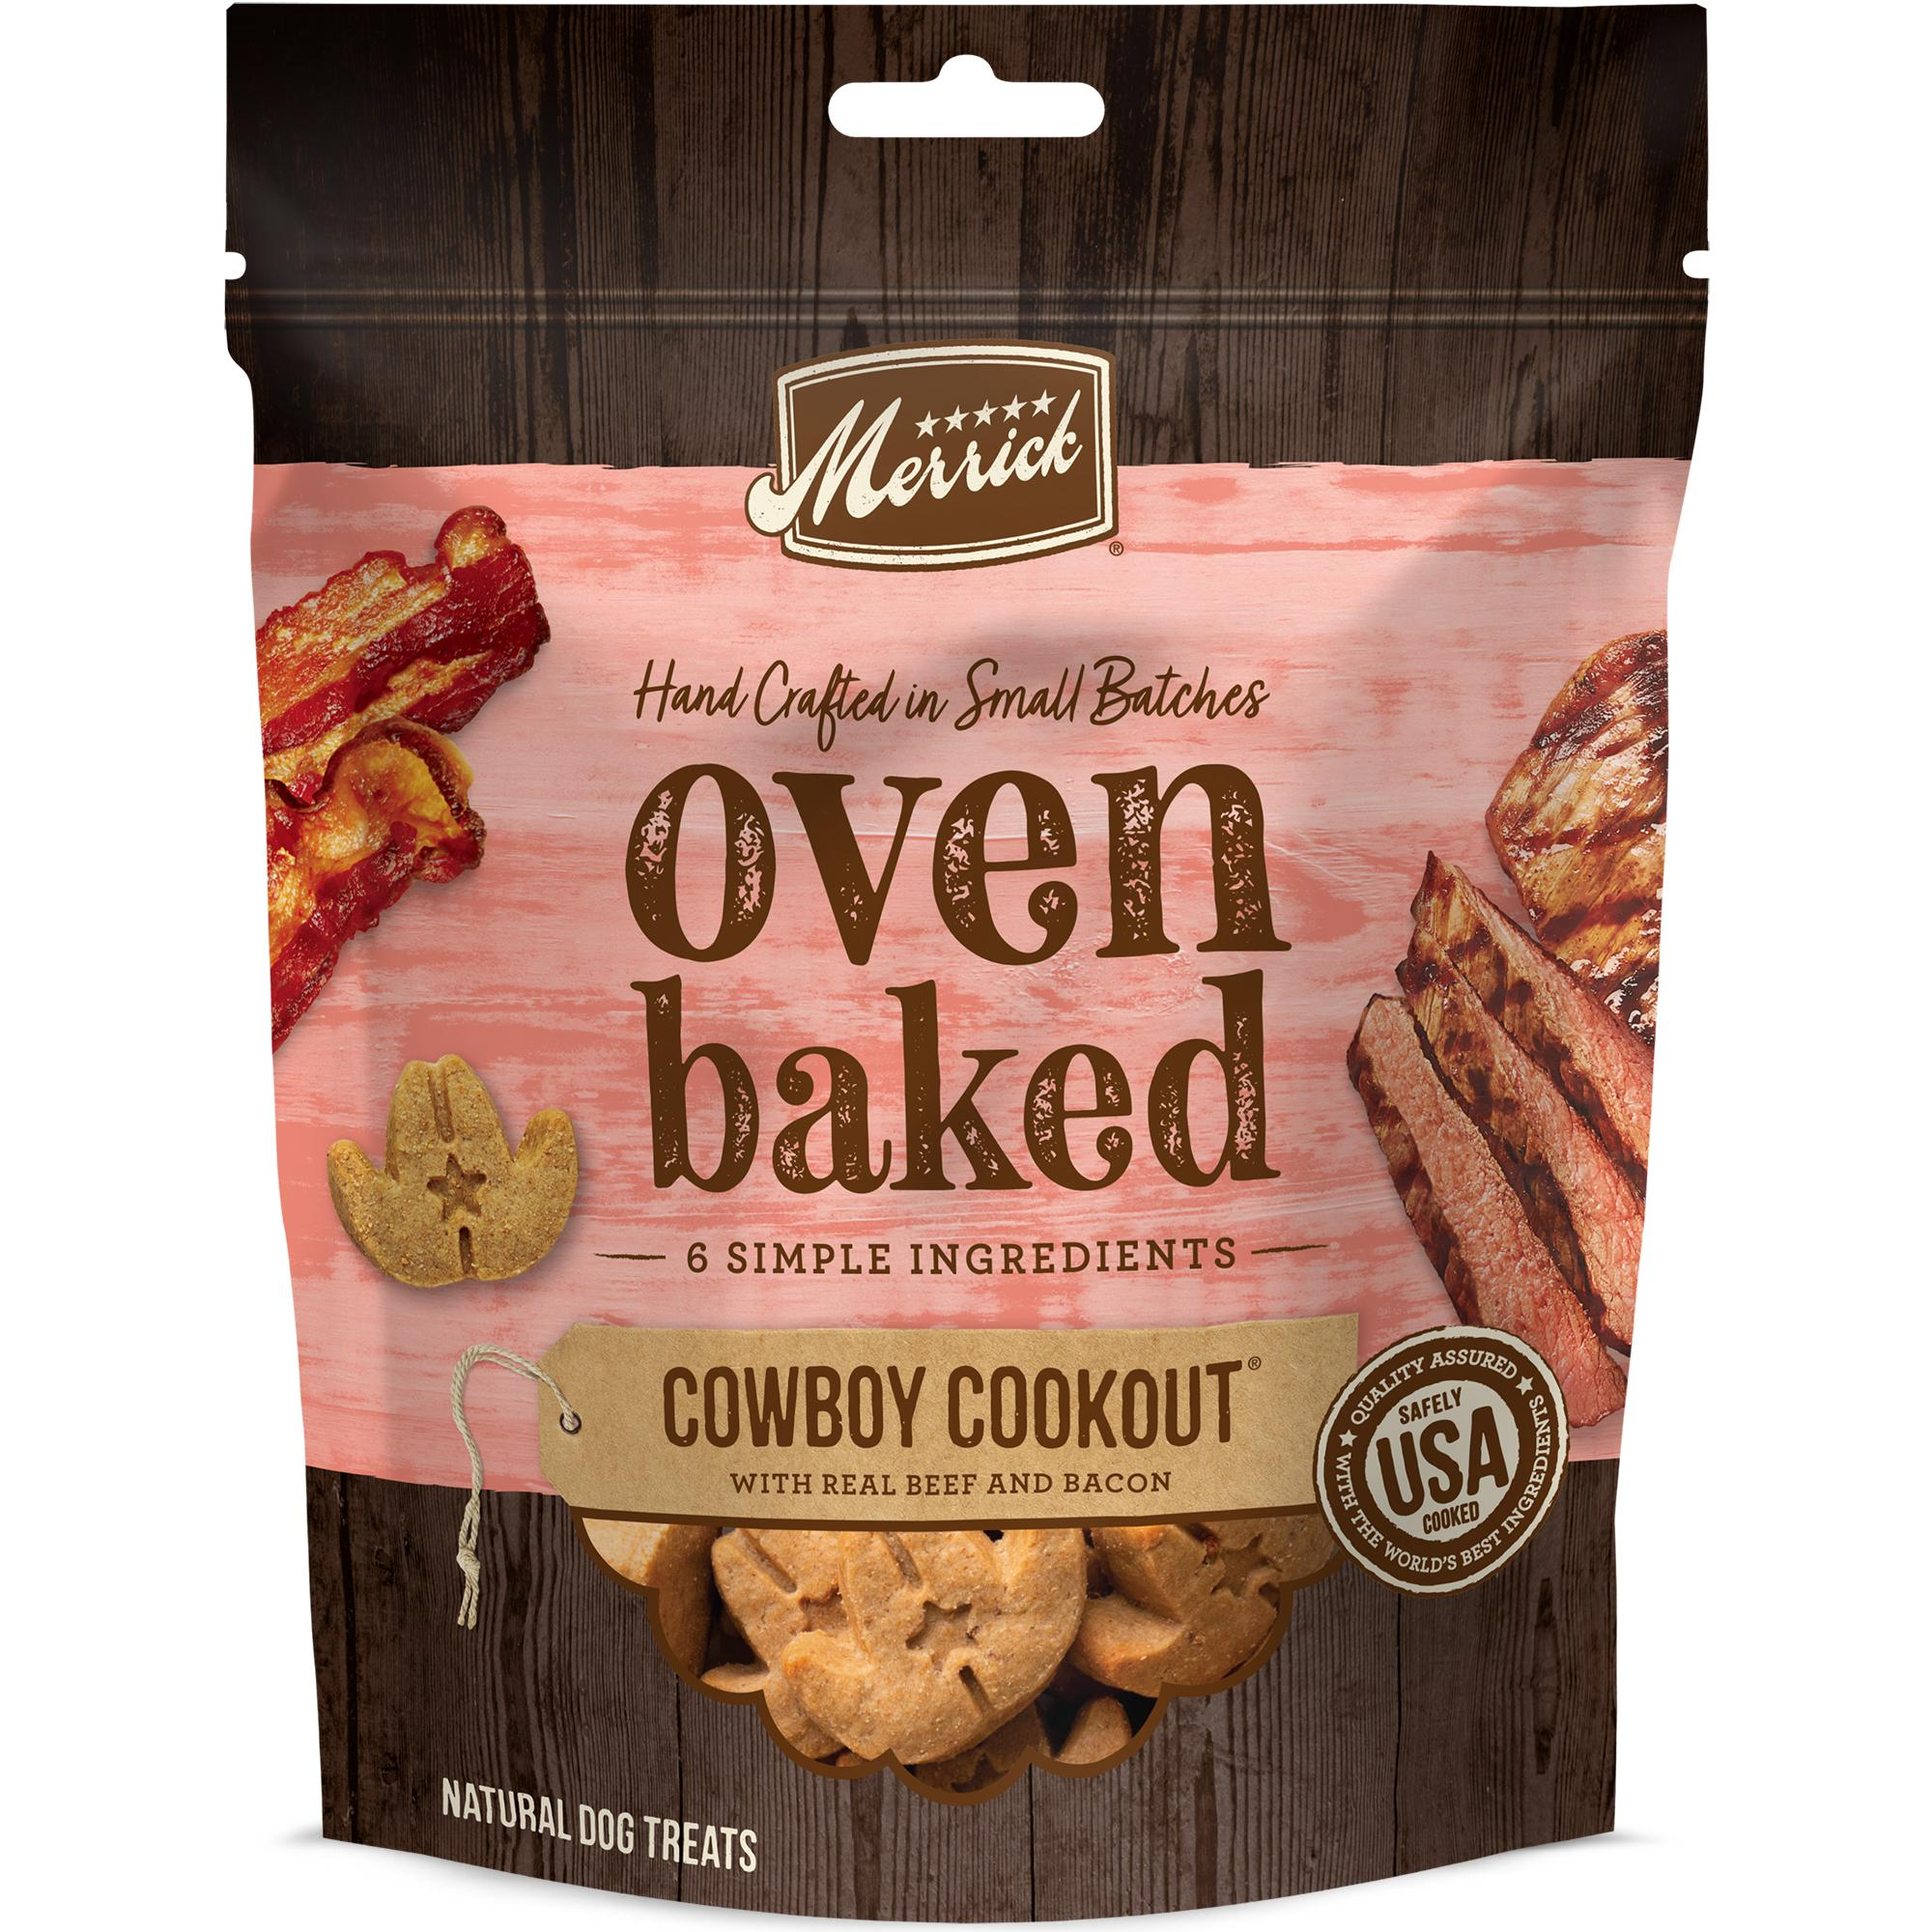 Merrick Oven Baked Cowboy Cookout Dog Treats Image